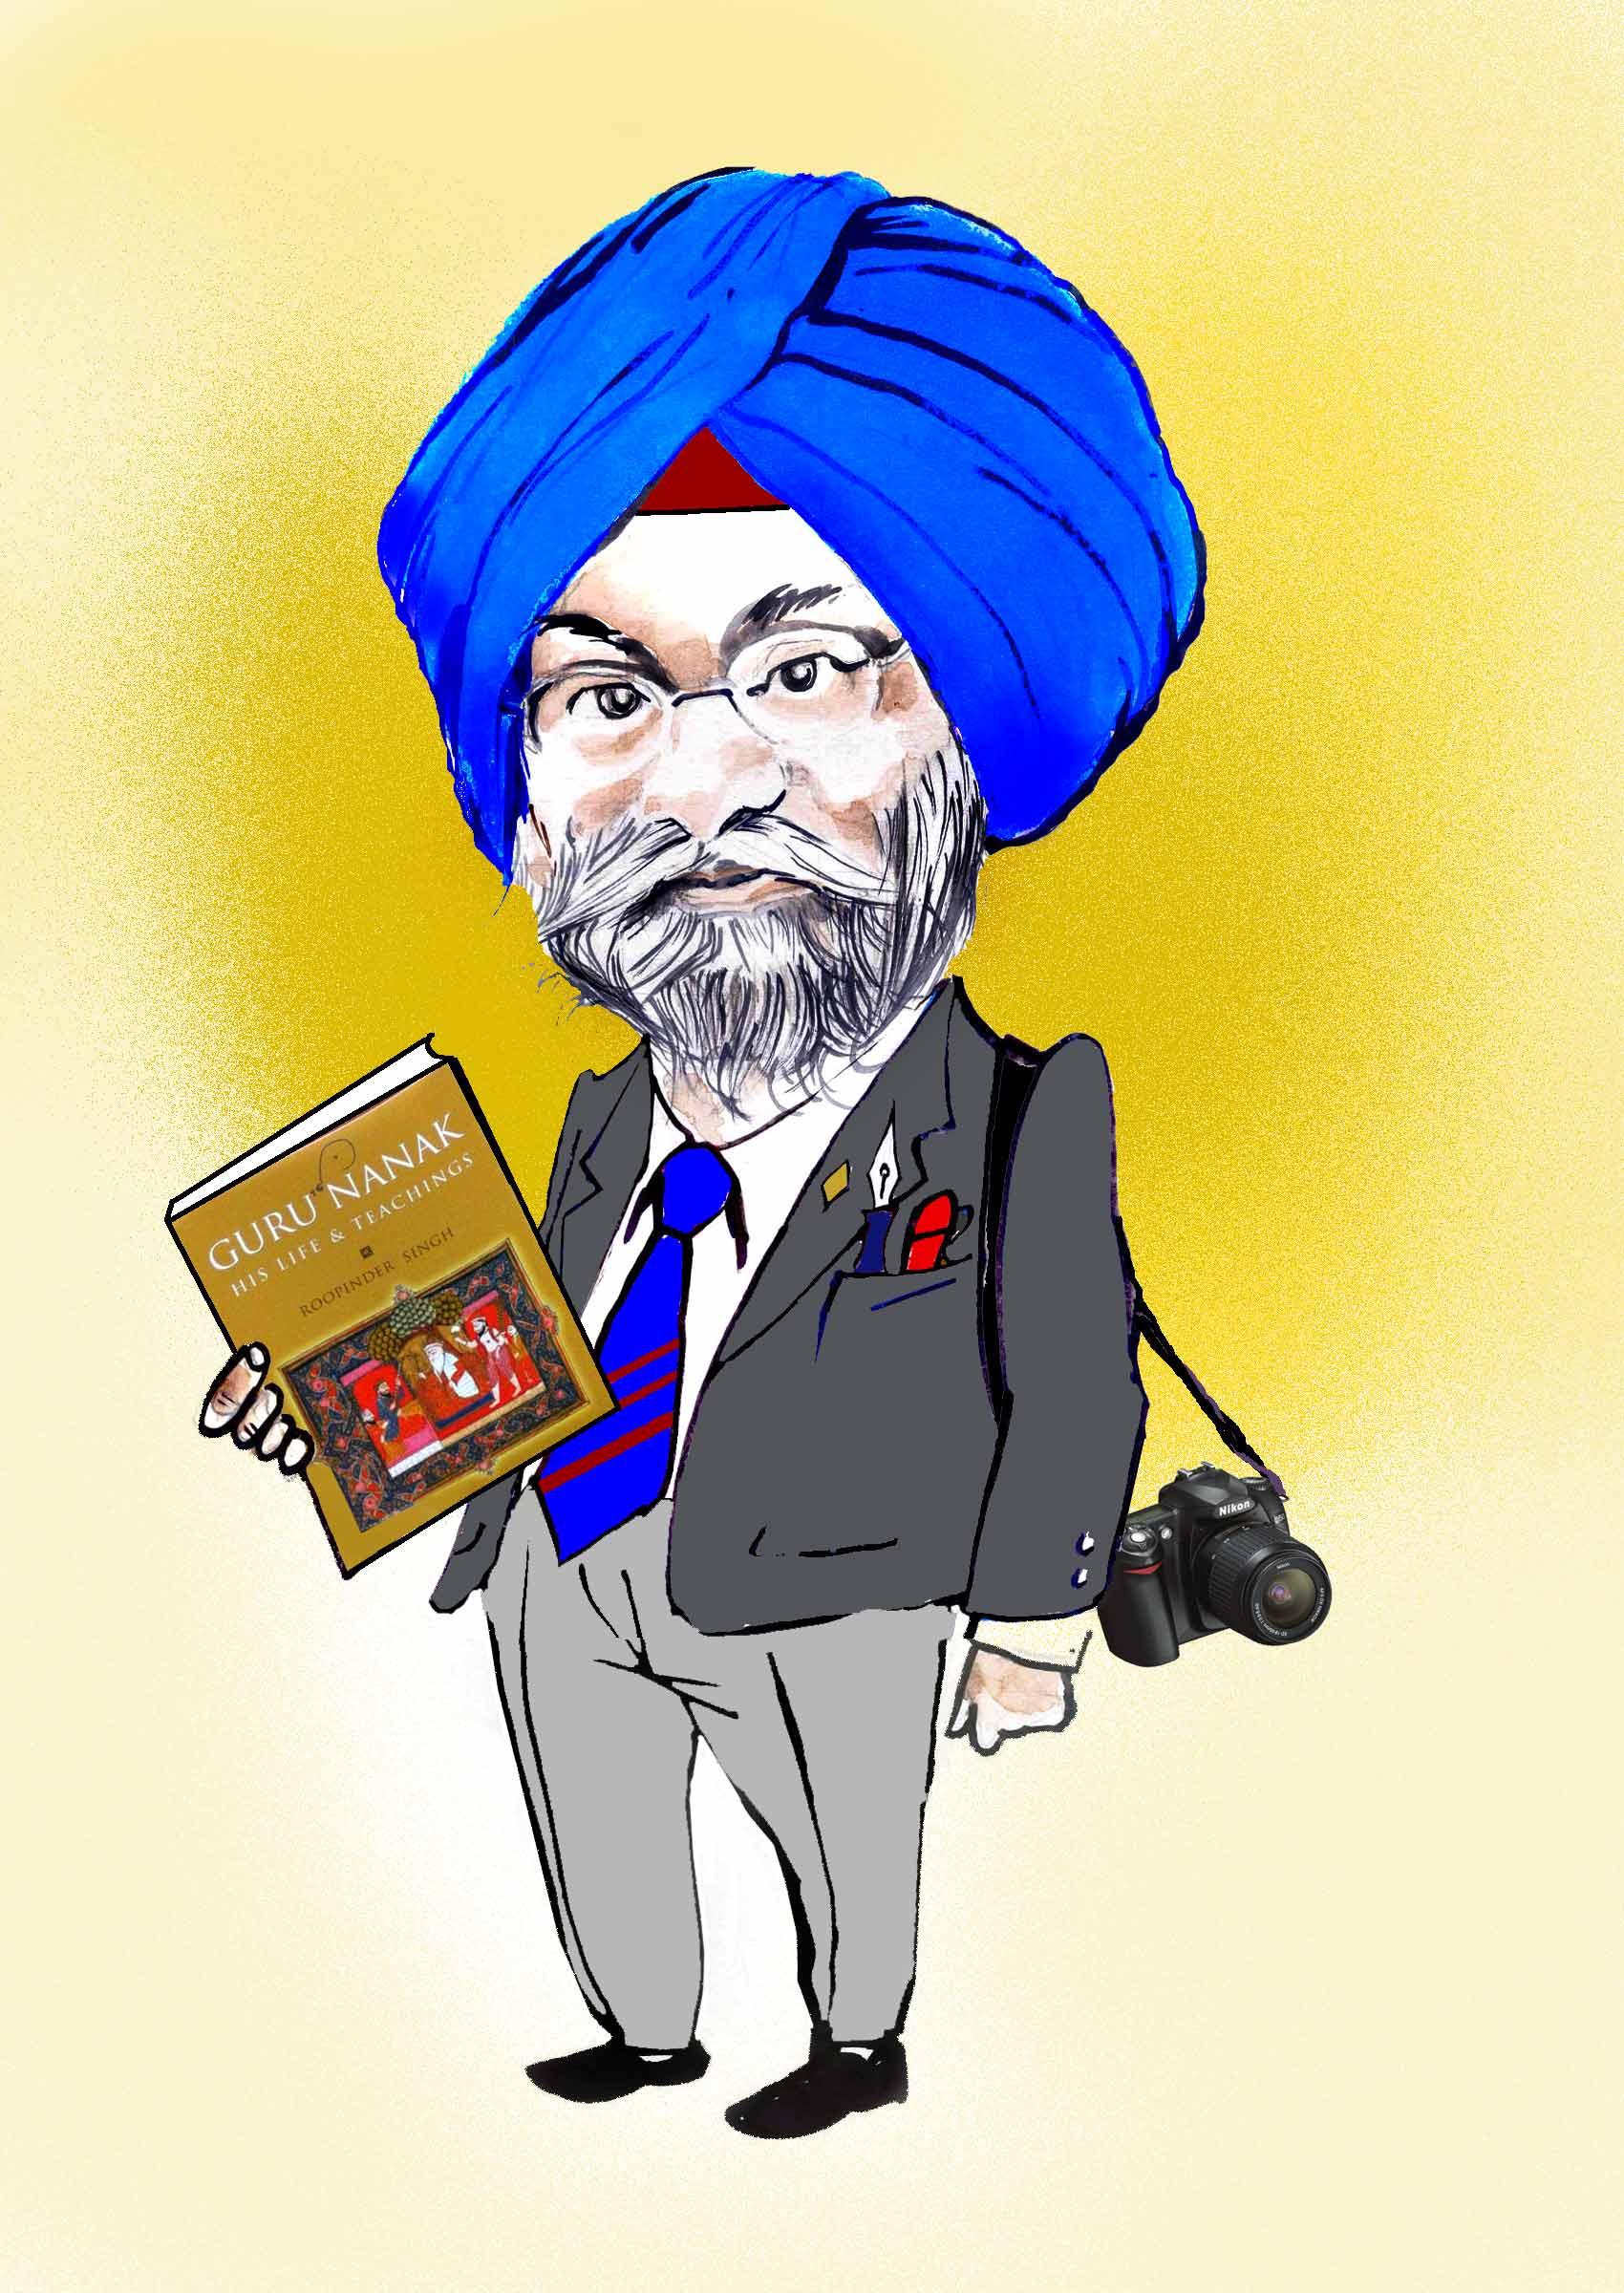 Roopinder's caricature by Sandeep Joshi